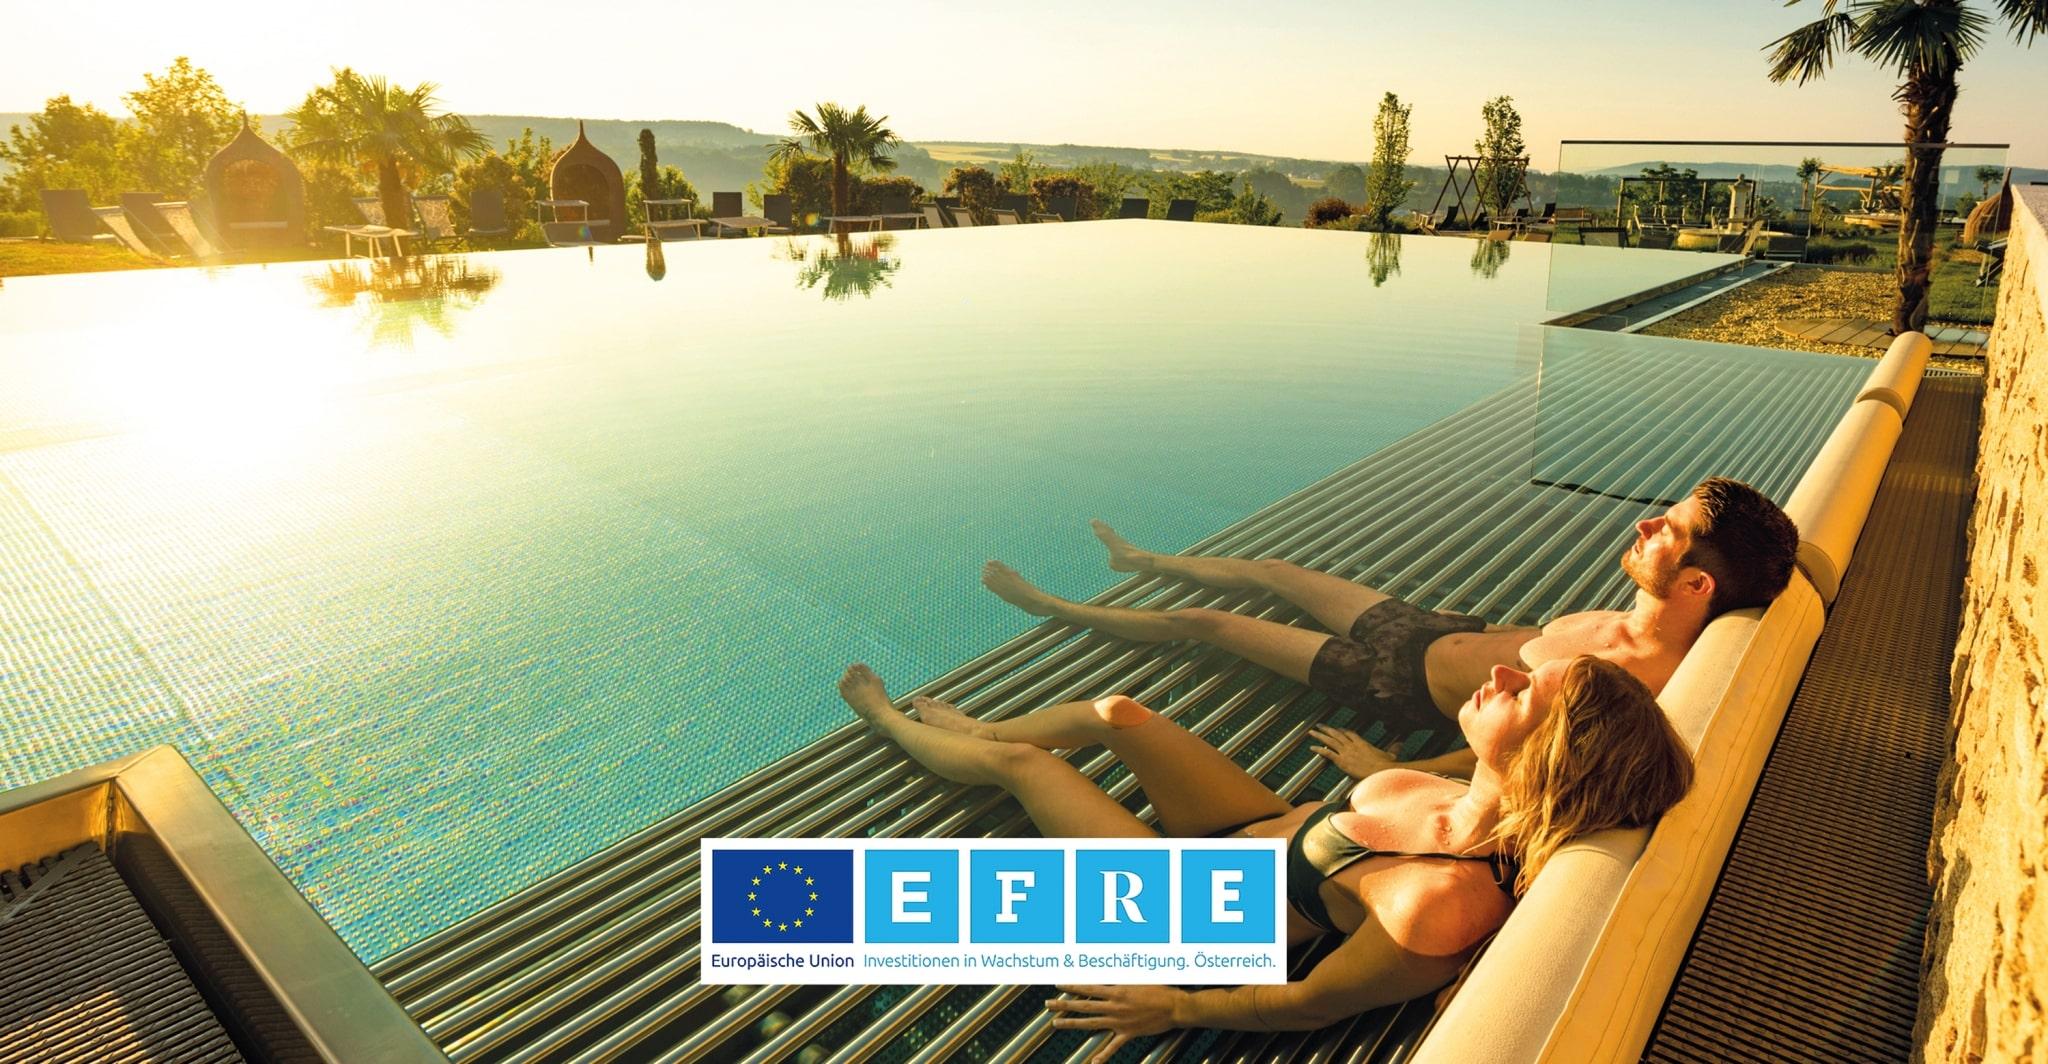 Infinity-Sportpool-EFRE-Europäische-Union-Hotel-Larimar